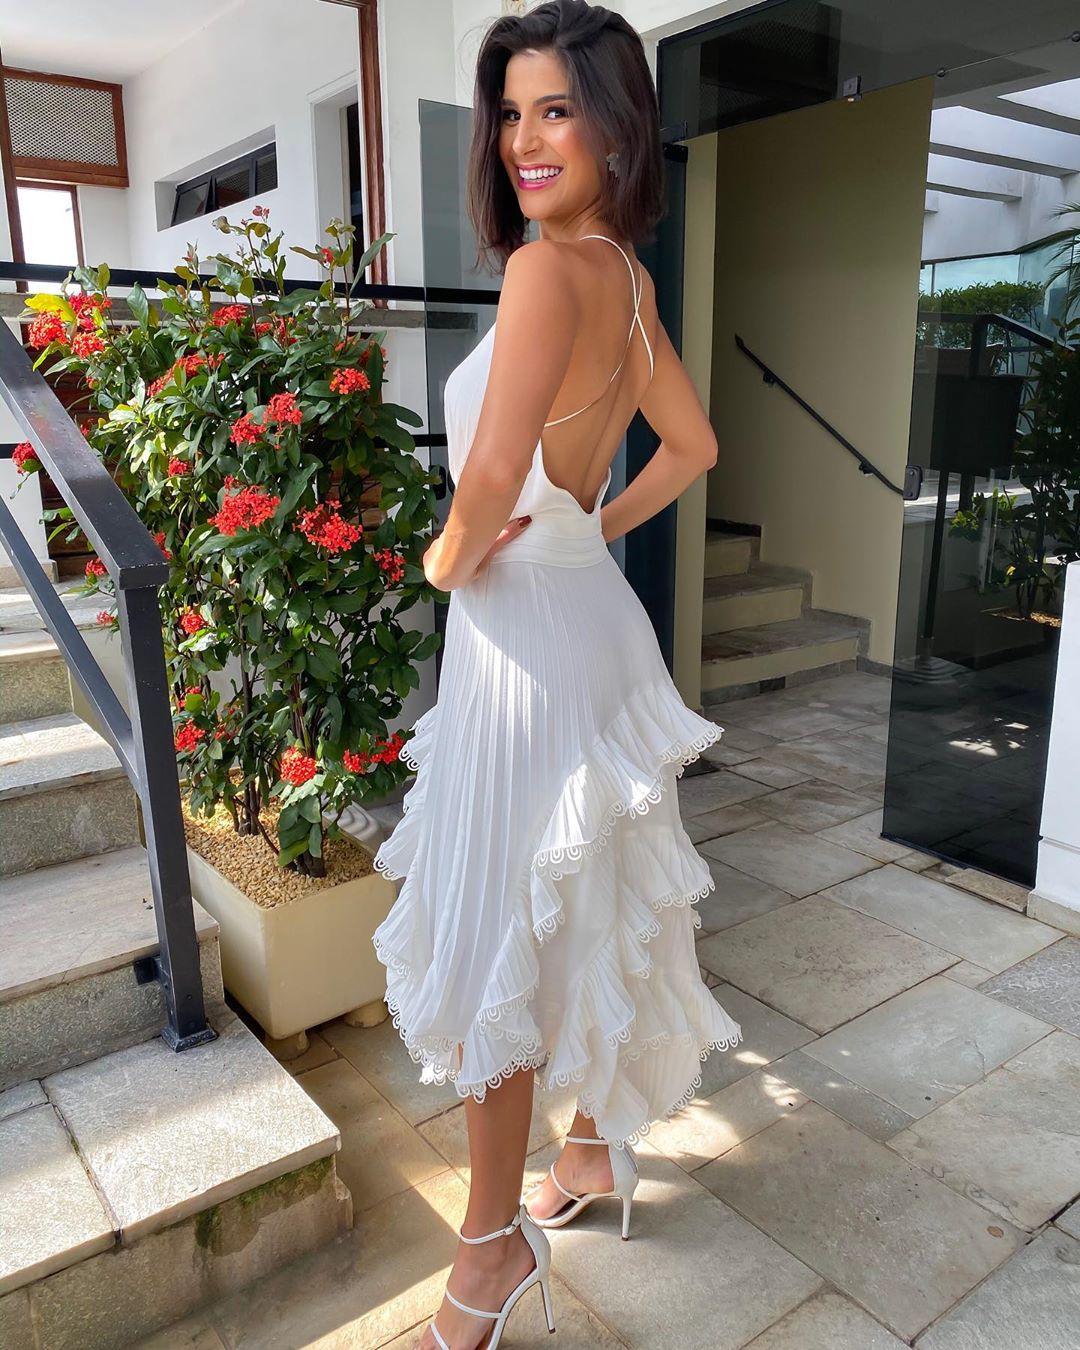 julia horta, miss brasil universo 2019/top 2 de reynado internacional cafe 2016, top 5 de miss tourism international 2017. - Página 72 74693312